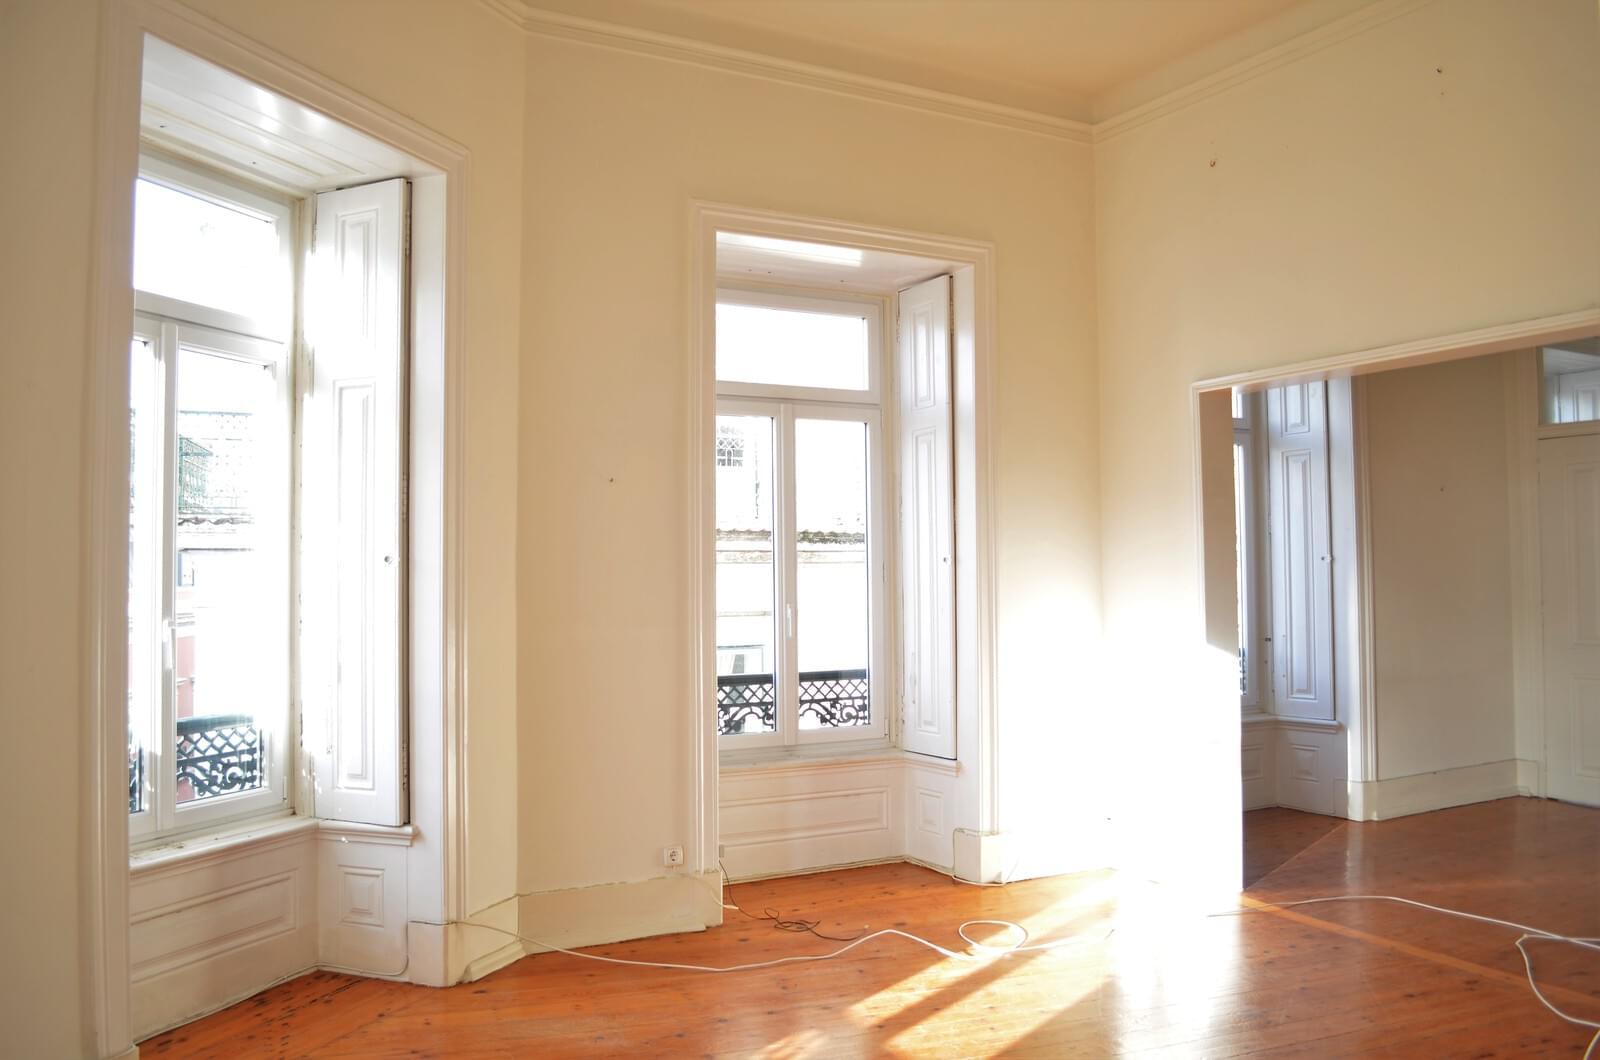 pf18621-apartamento-t4-lisboa-e9fded73-314b-487b-b1df-c5ef64366aa7